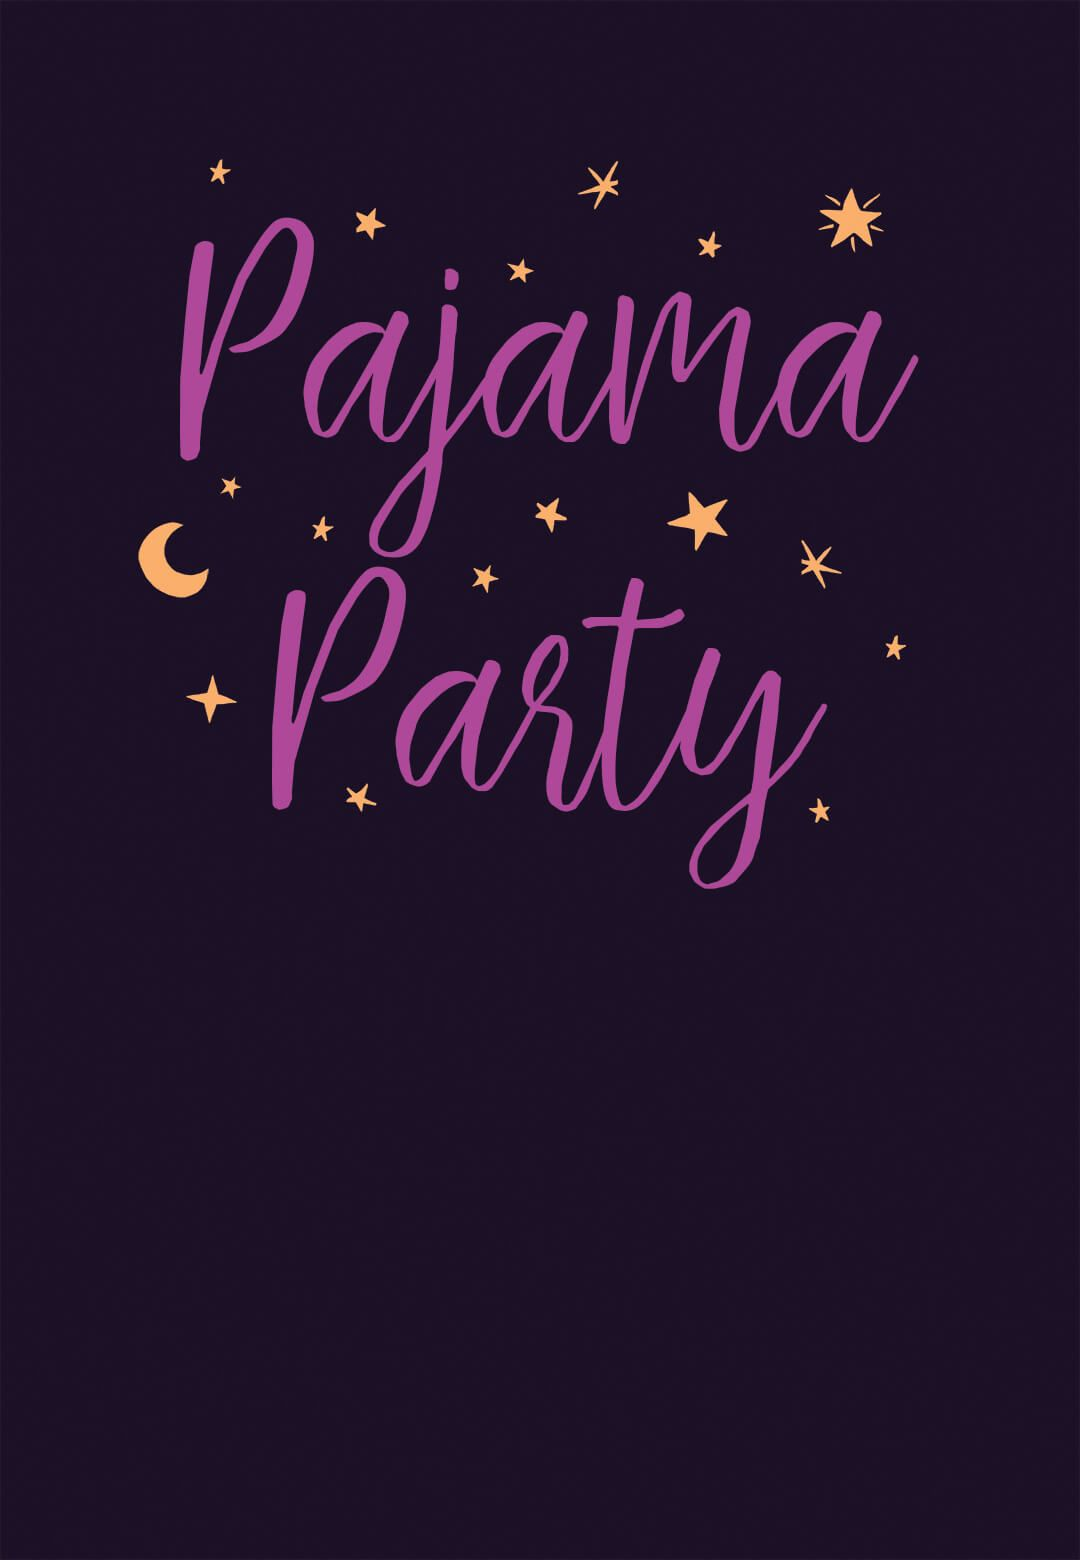 Pajama Party Free Sleepover Party Invitation Template Greetings regarding size 1080 X 1560